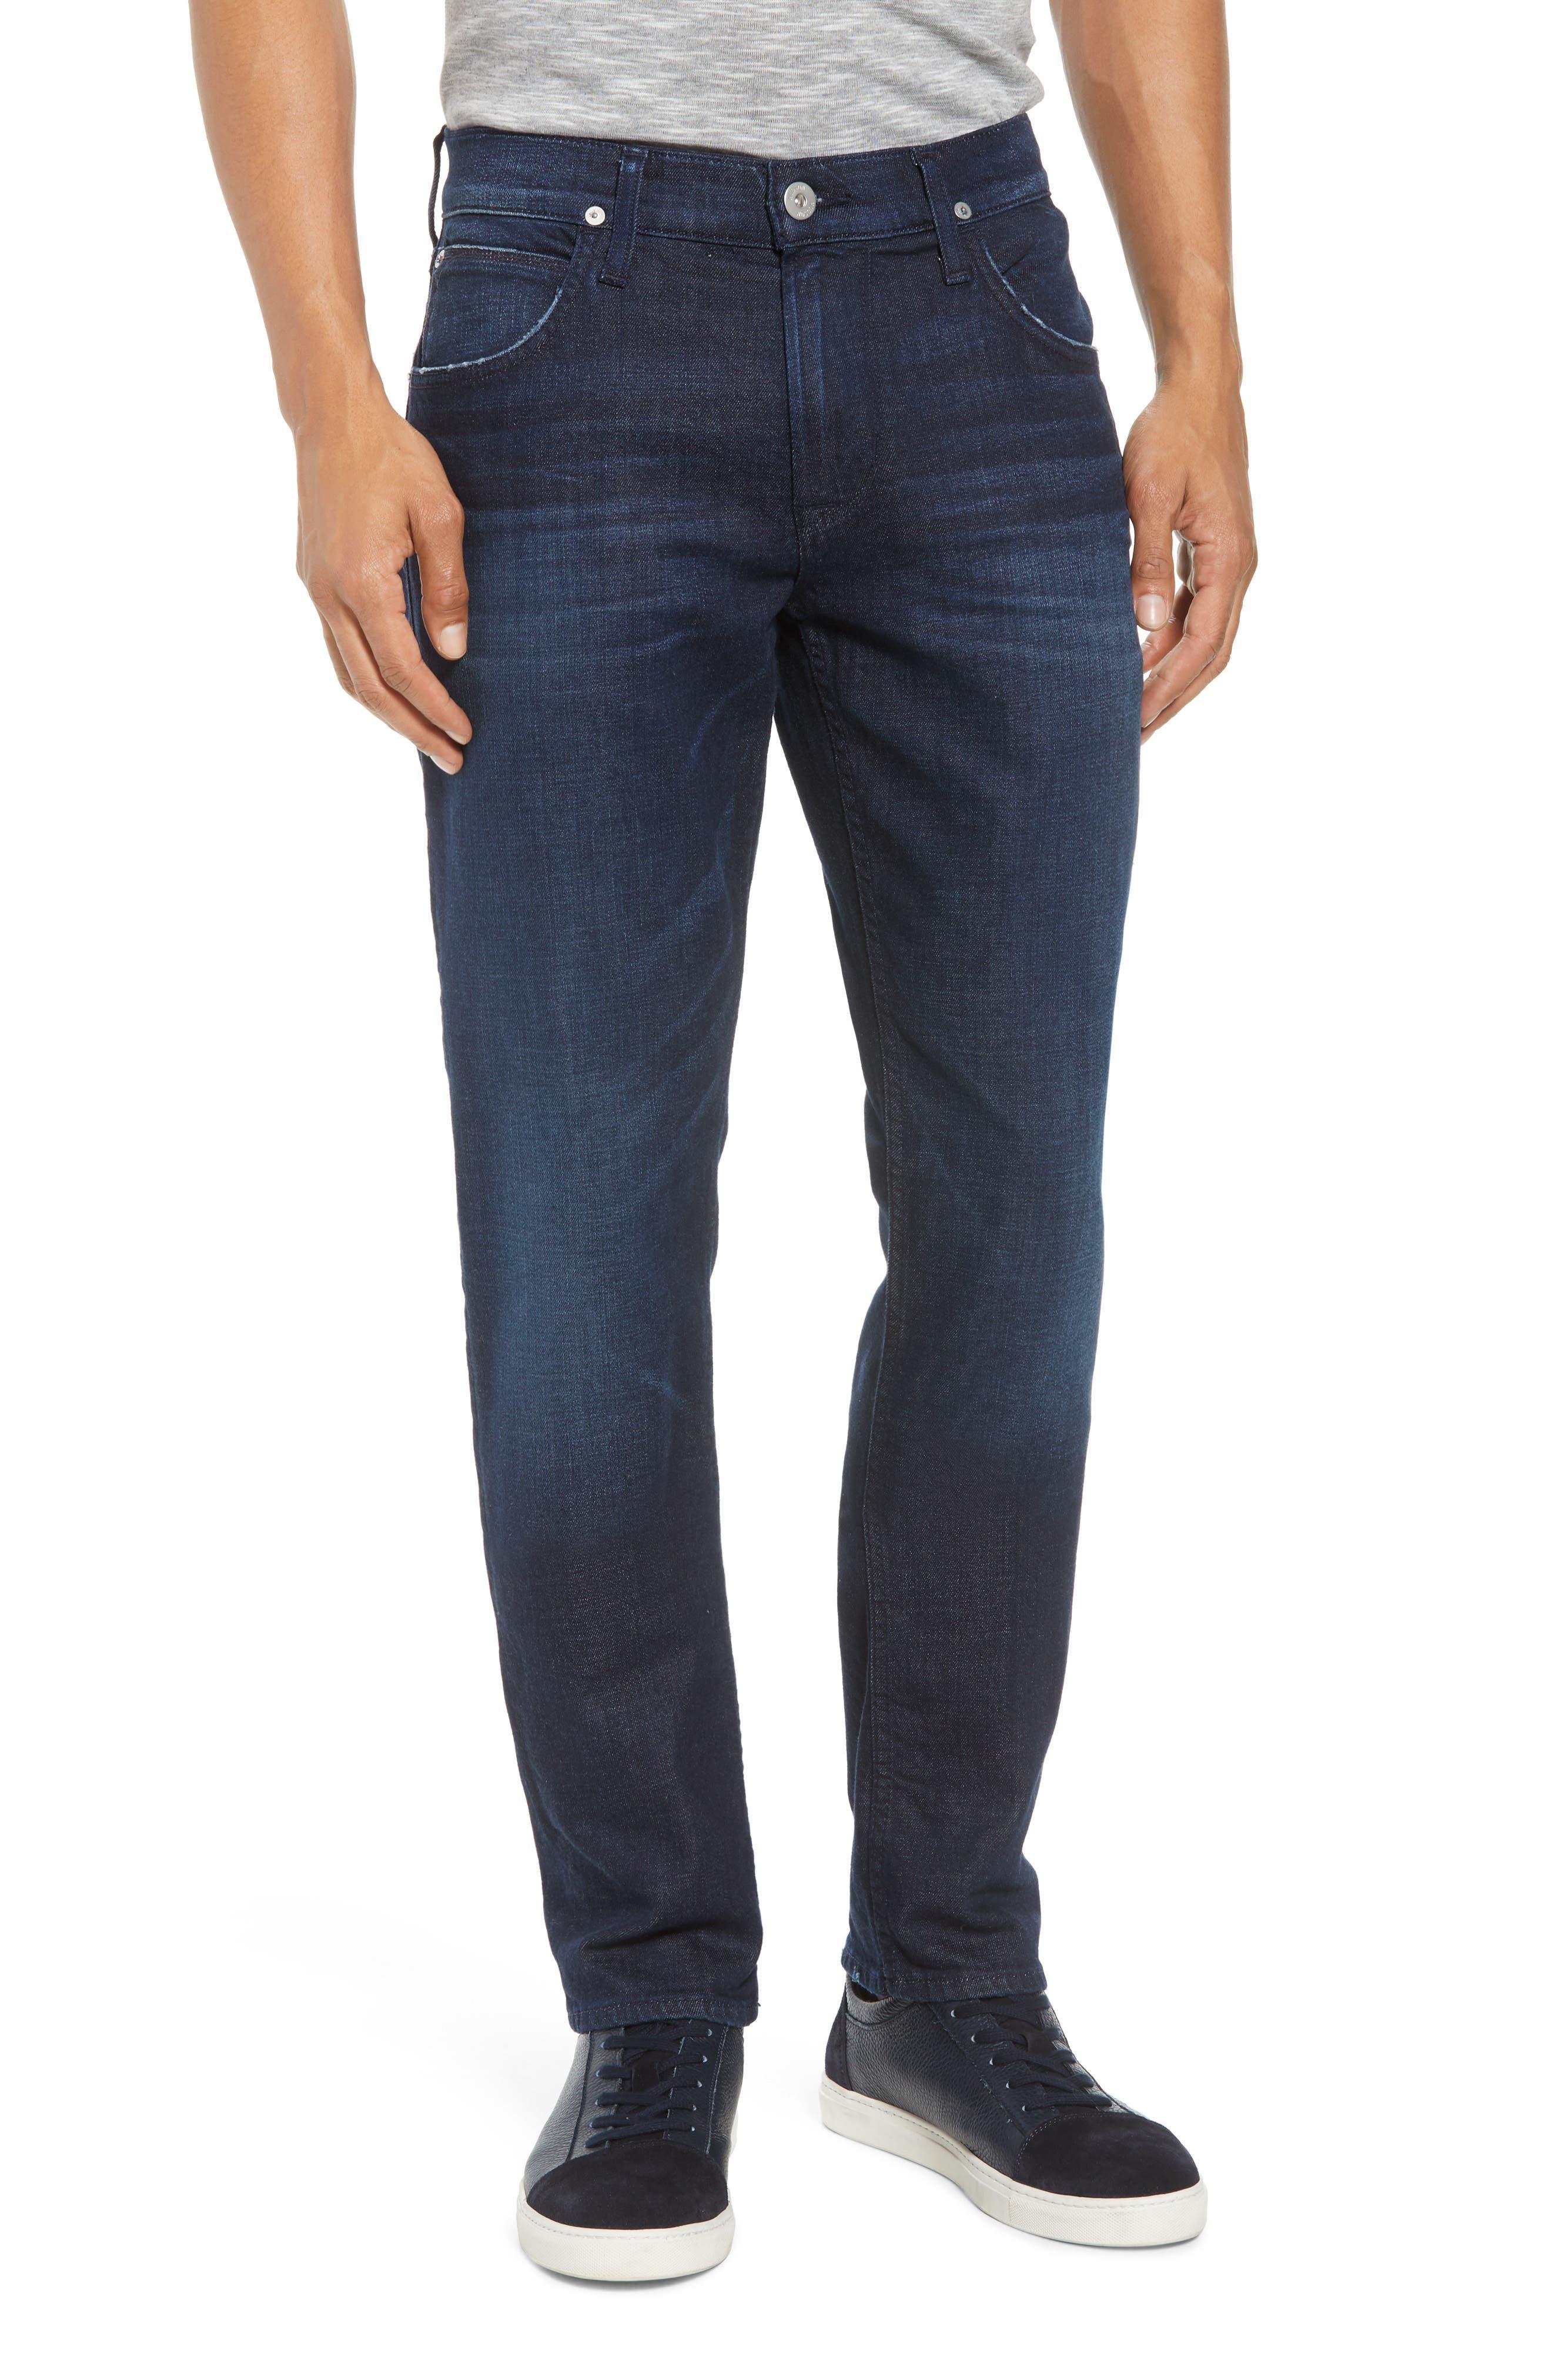 Blake Slim Fit Jeans,                         Main,                         color, BARRY